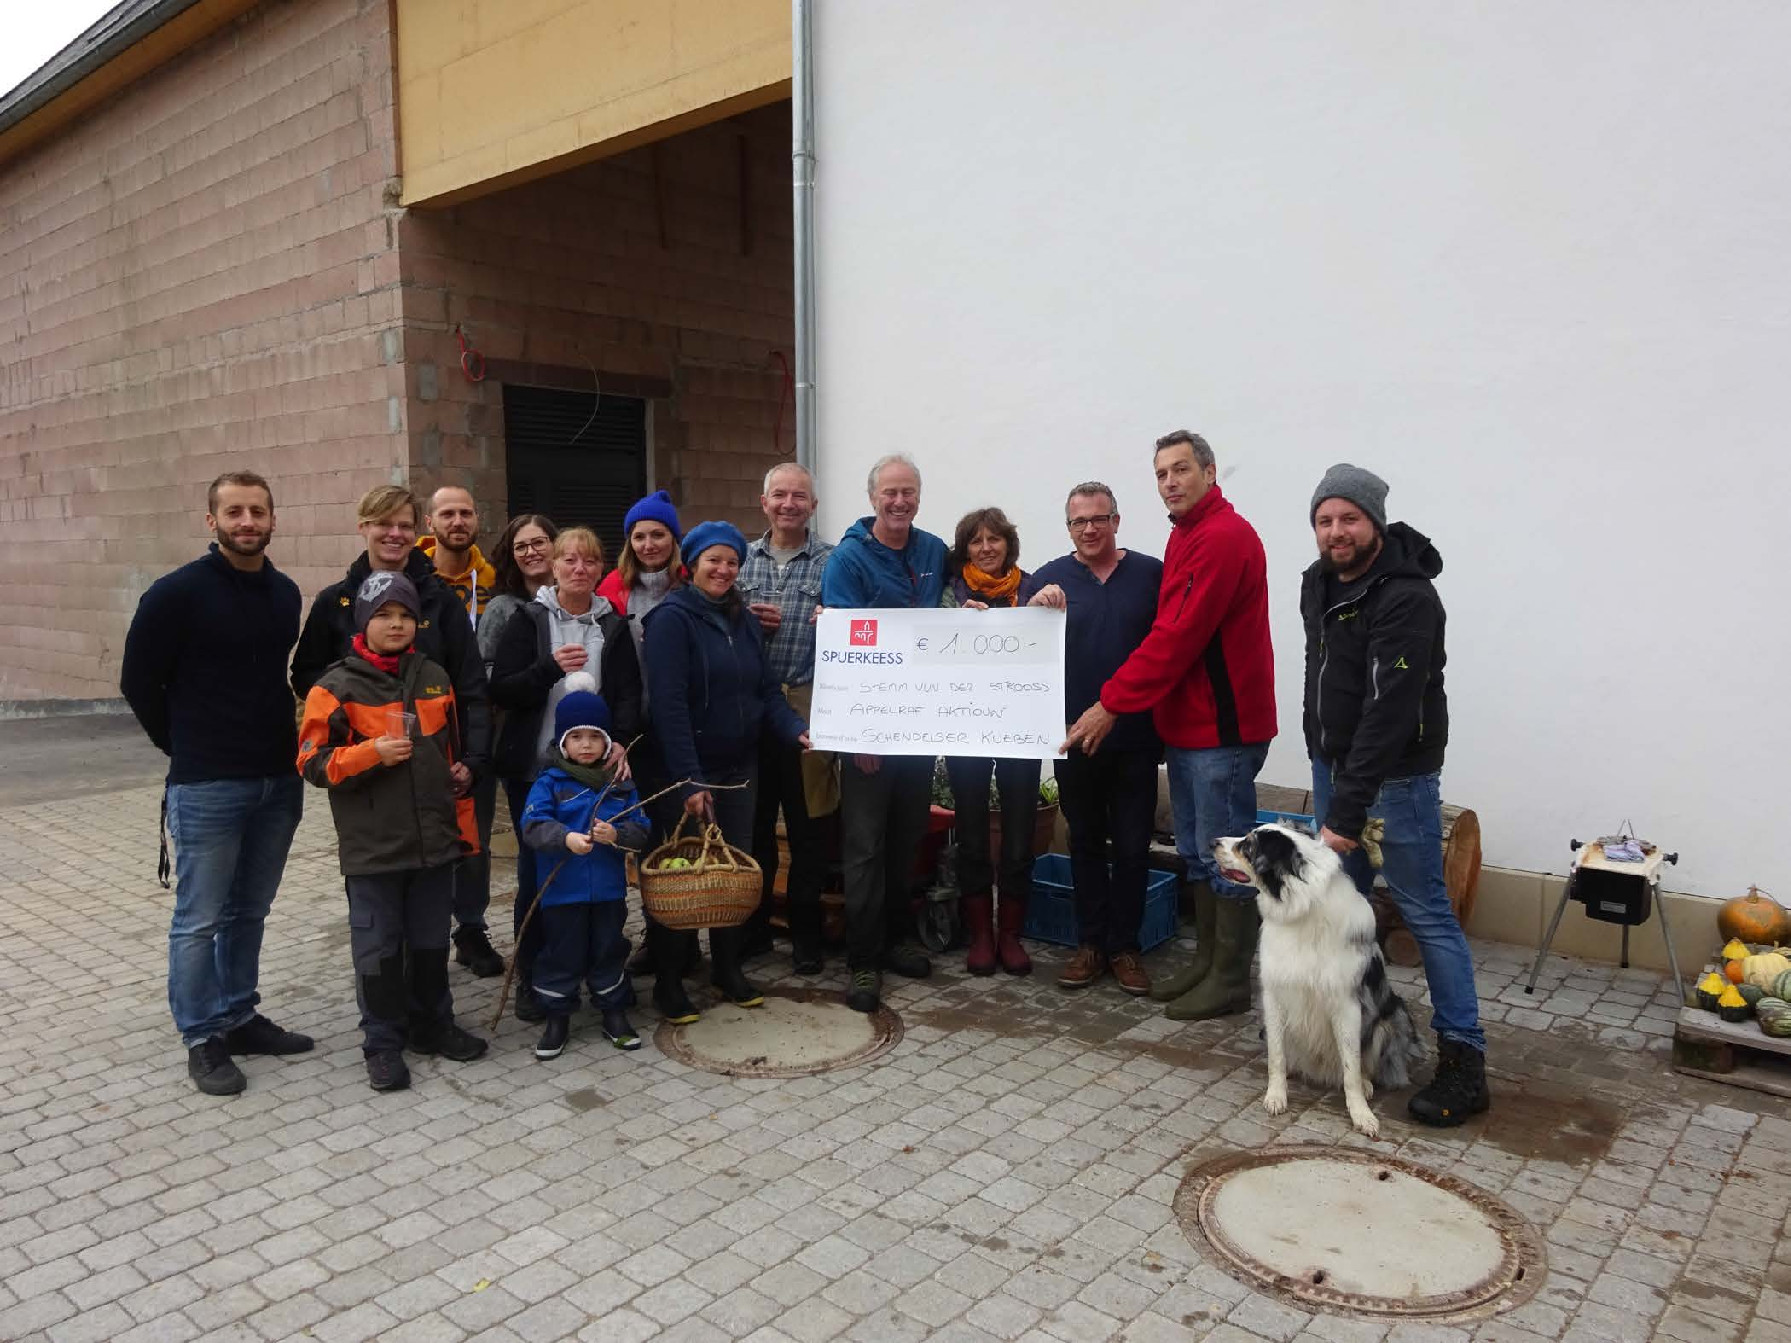 Stëmm's receives 1 000 € from Schendelser Kueben to equip its new shed